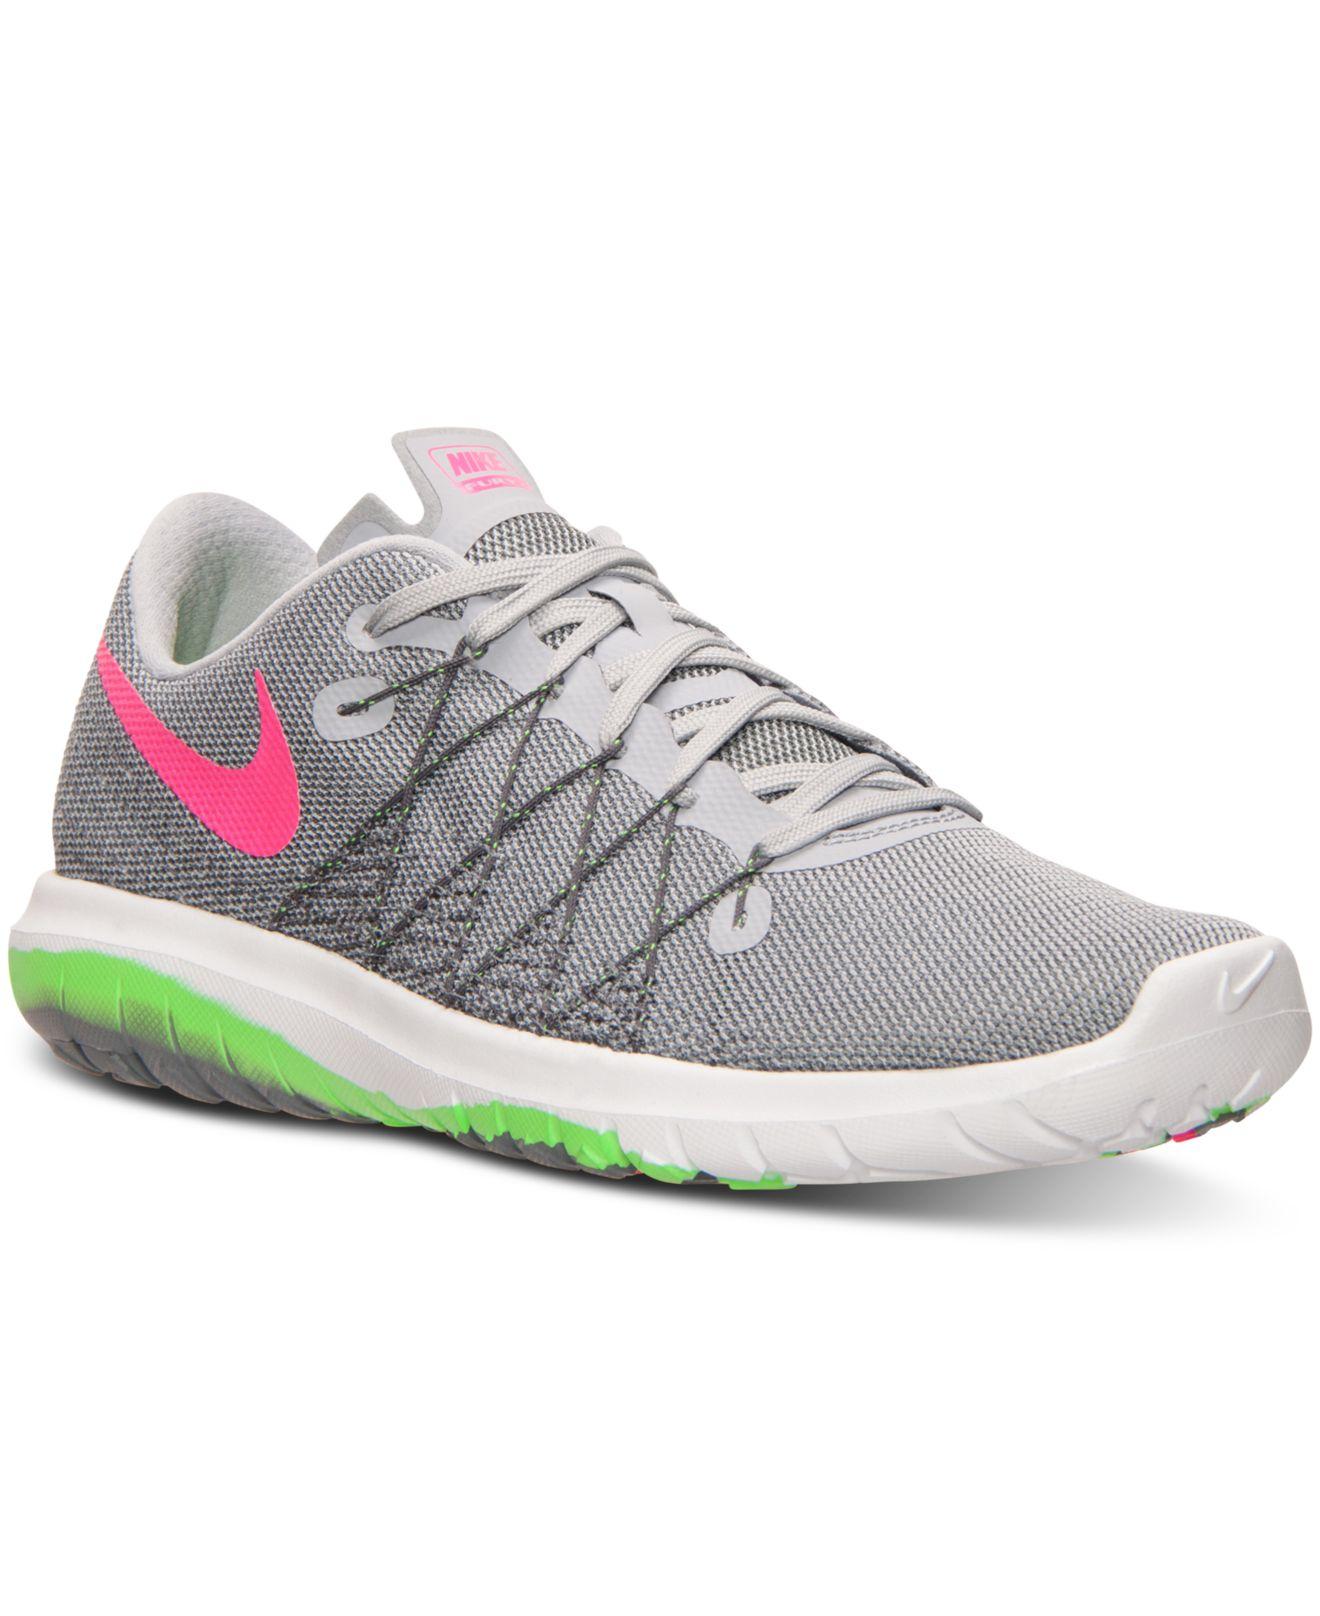 Lyst - Nike Women s Flex Fury 2 Running Sneakers From Finish Line in ... 9f22db4cf9